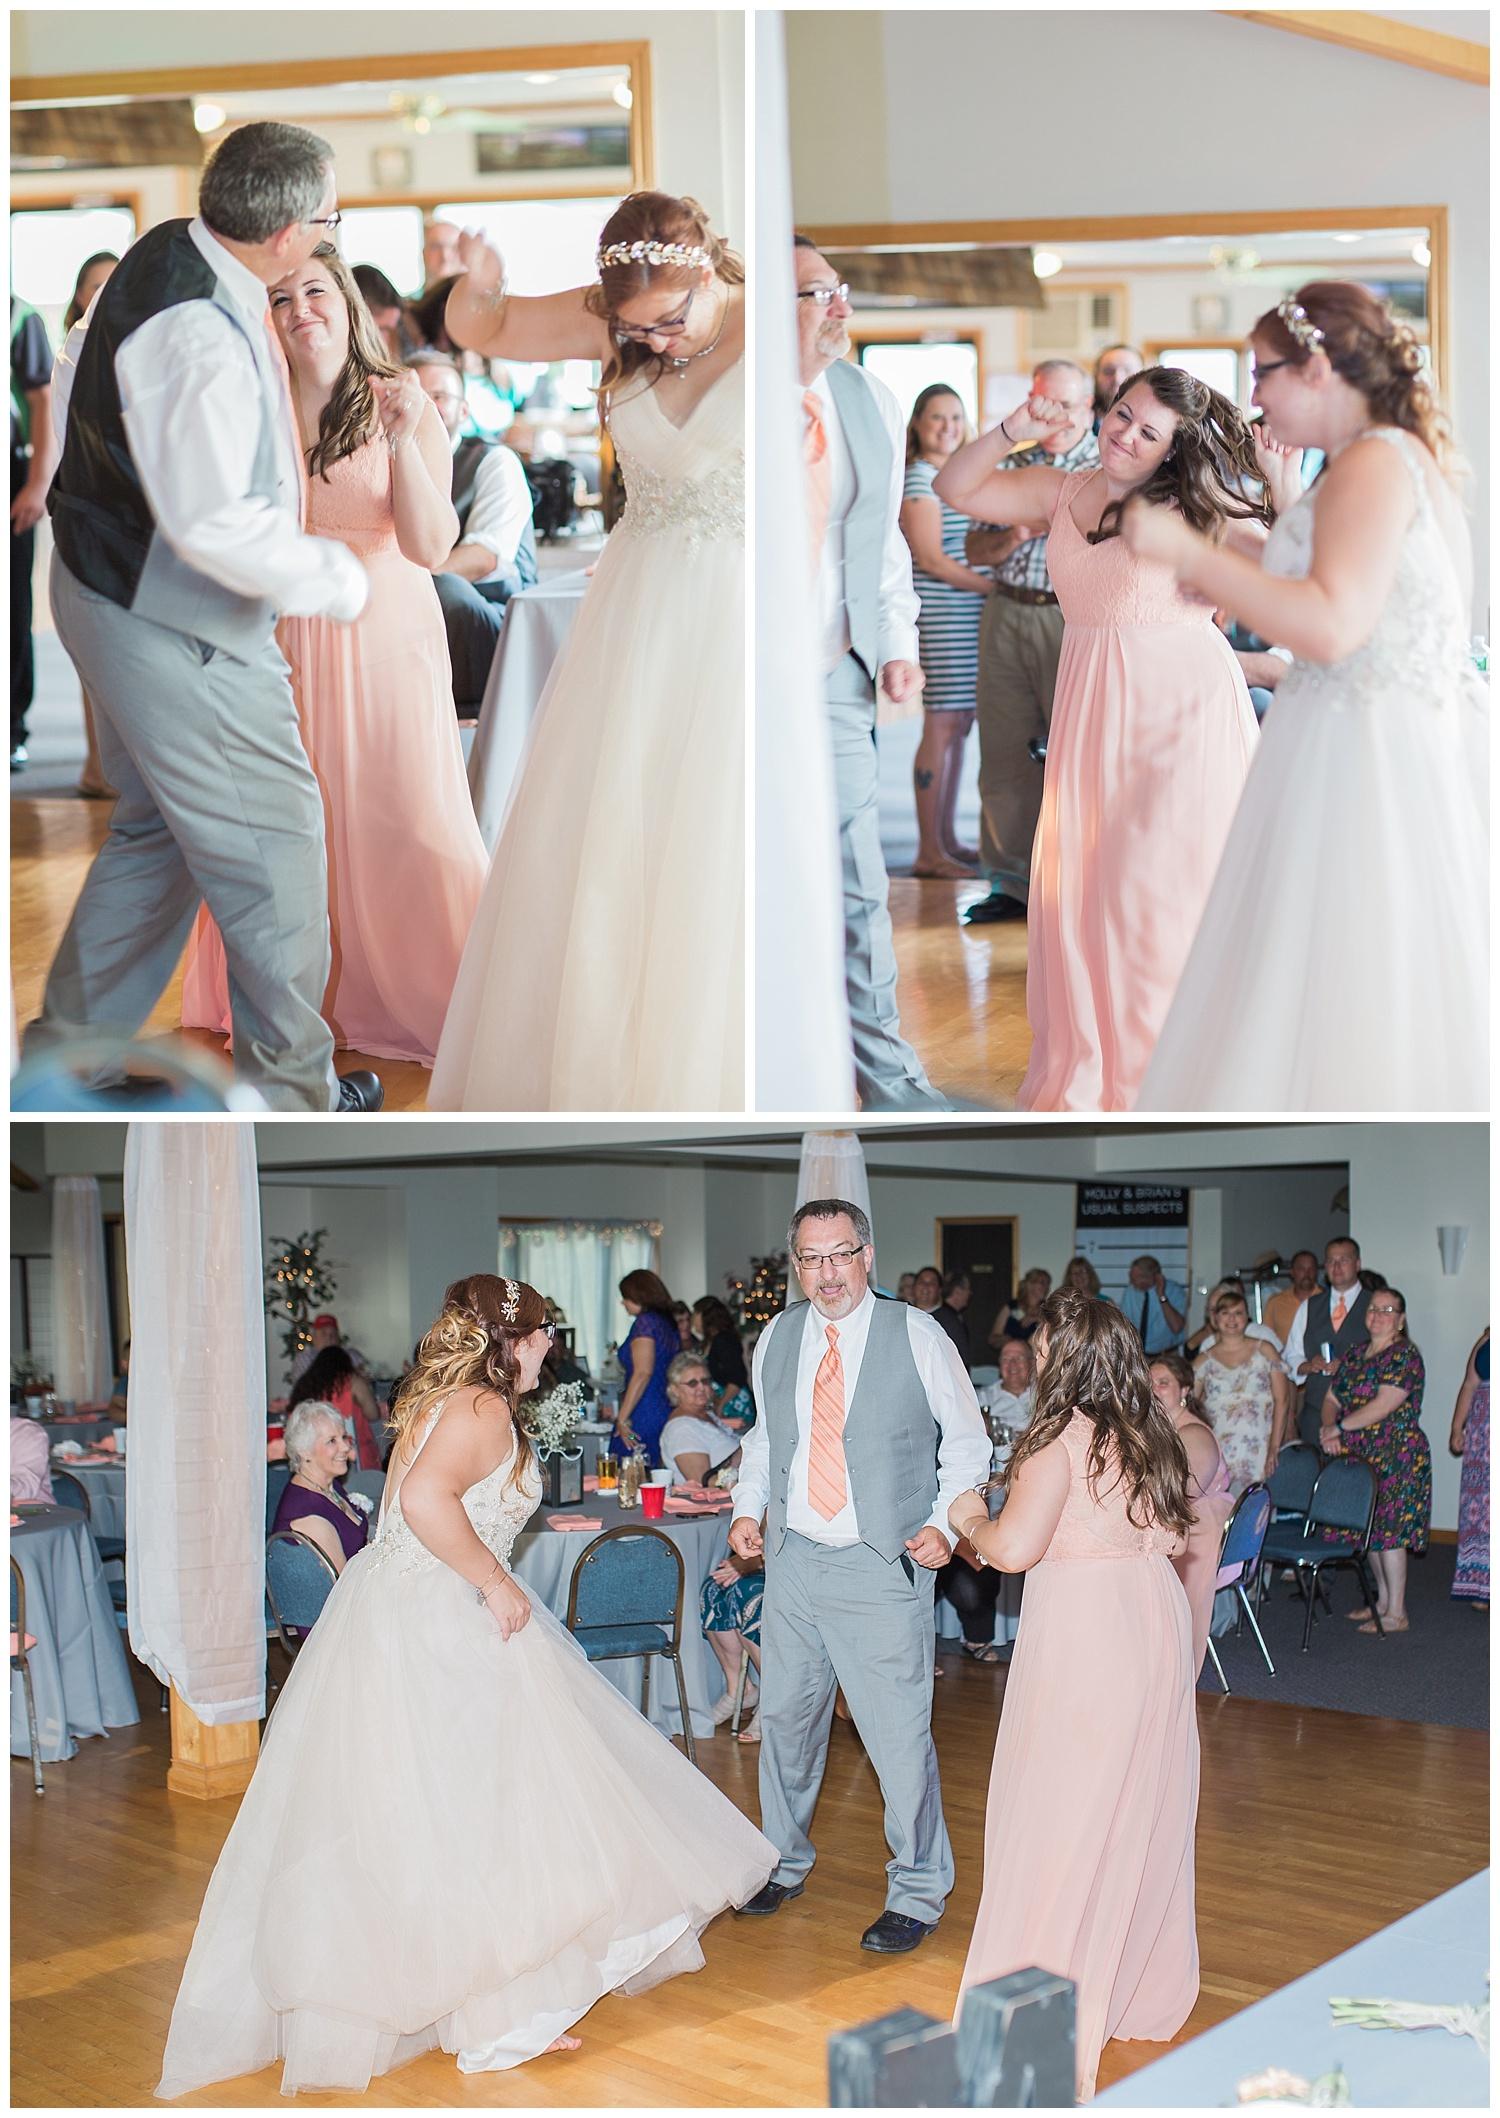 Brian and Molly Wed in Conesus NY - Lass & Beau-1183_Buffalo wedding photography.jpg